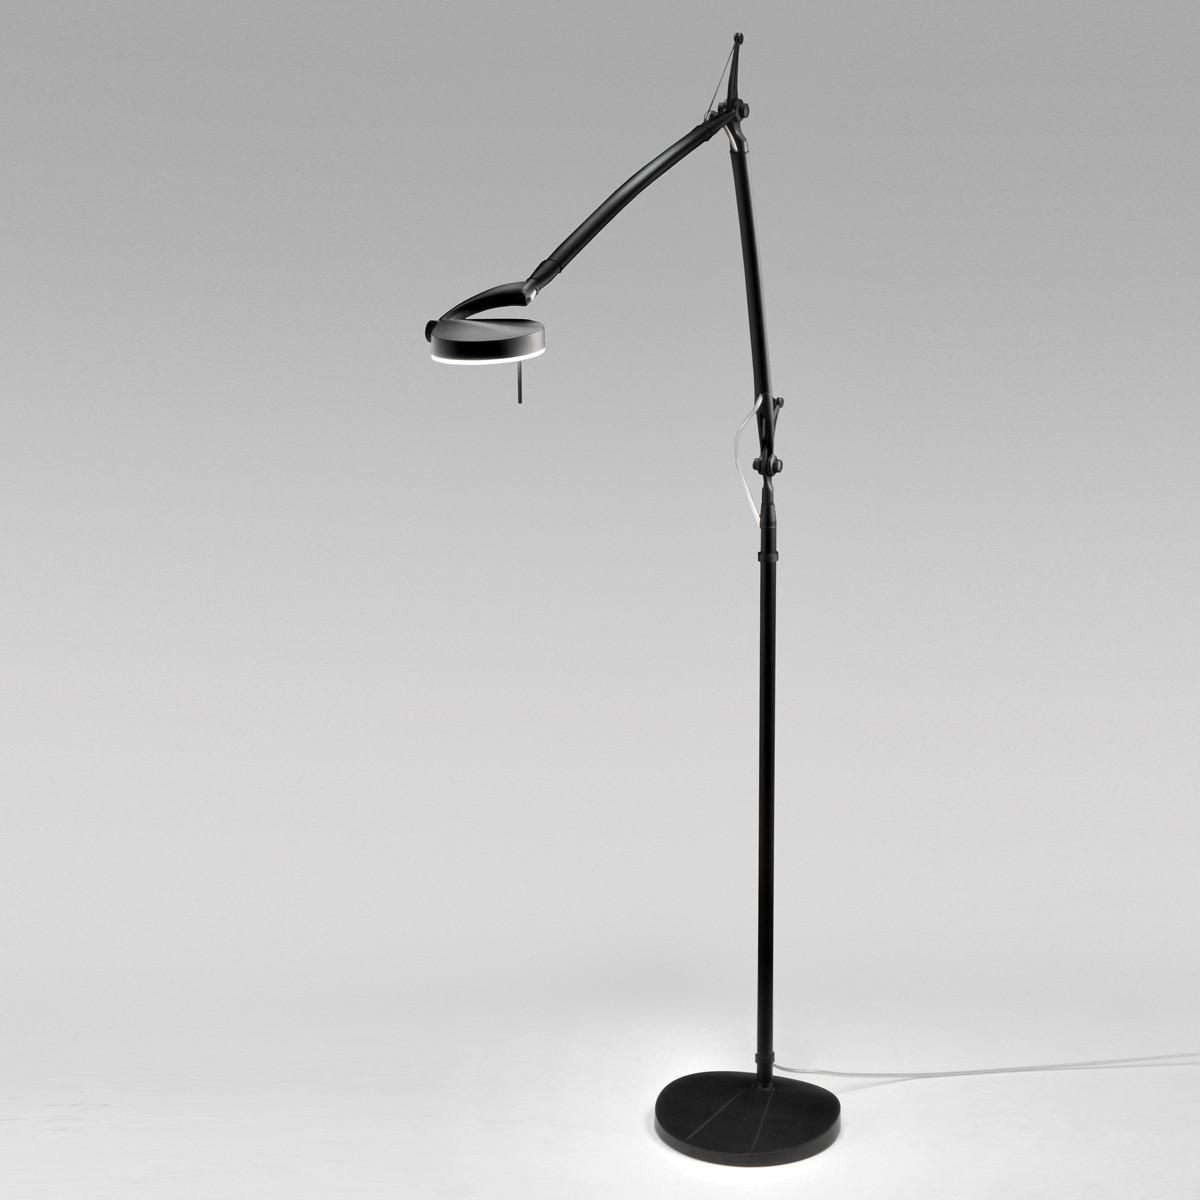 Milan Perceval LED Stehleuchte, schwarz lackiert